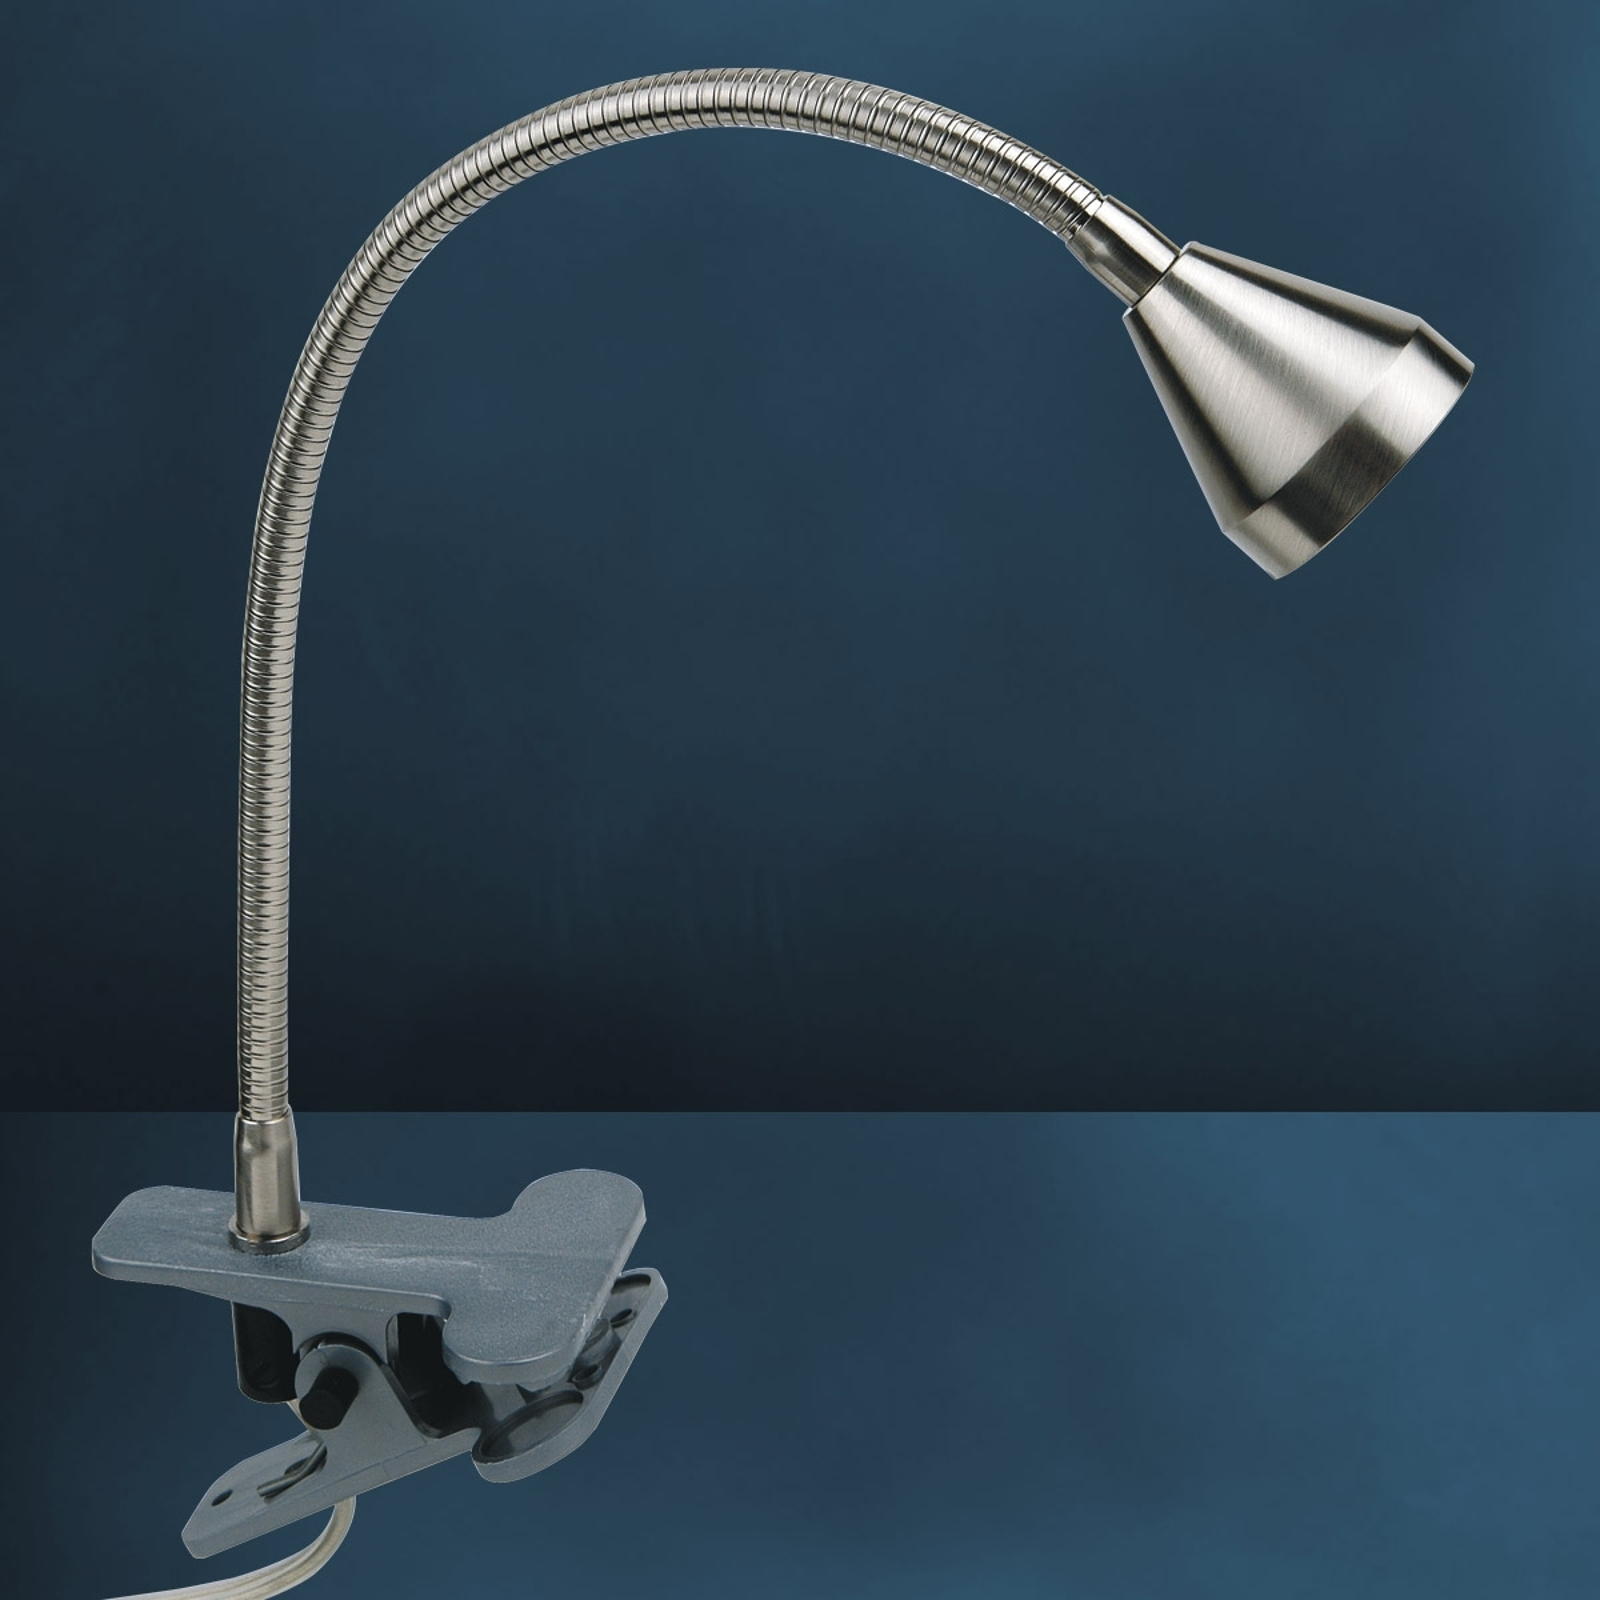 Funktionale LED-Klemmleuchte MINI, warmweiß